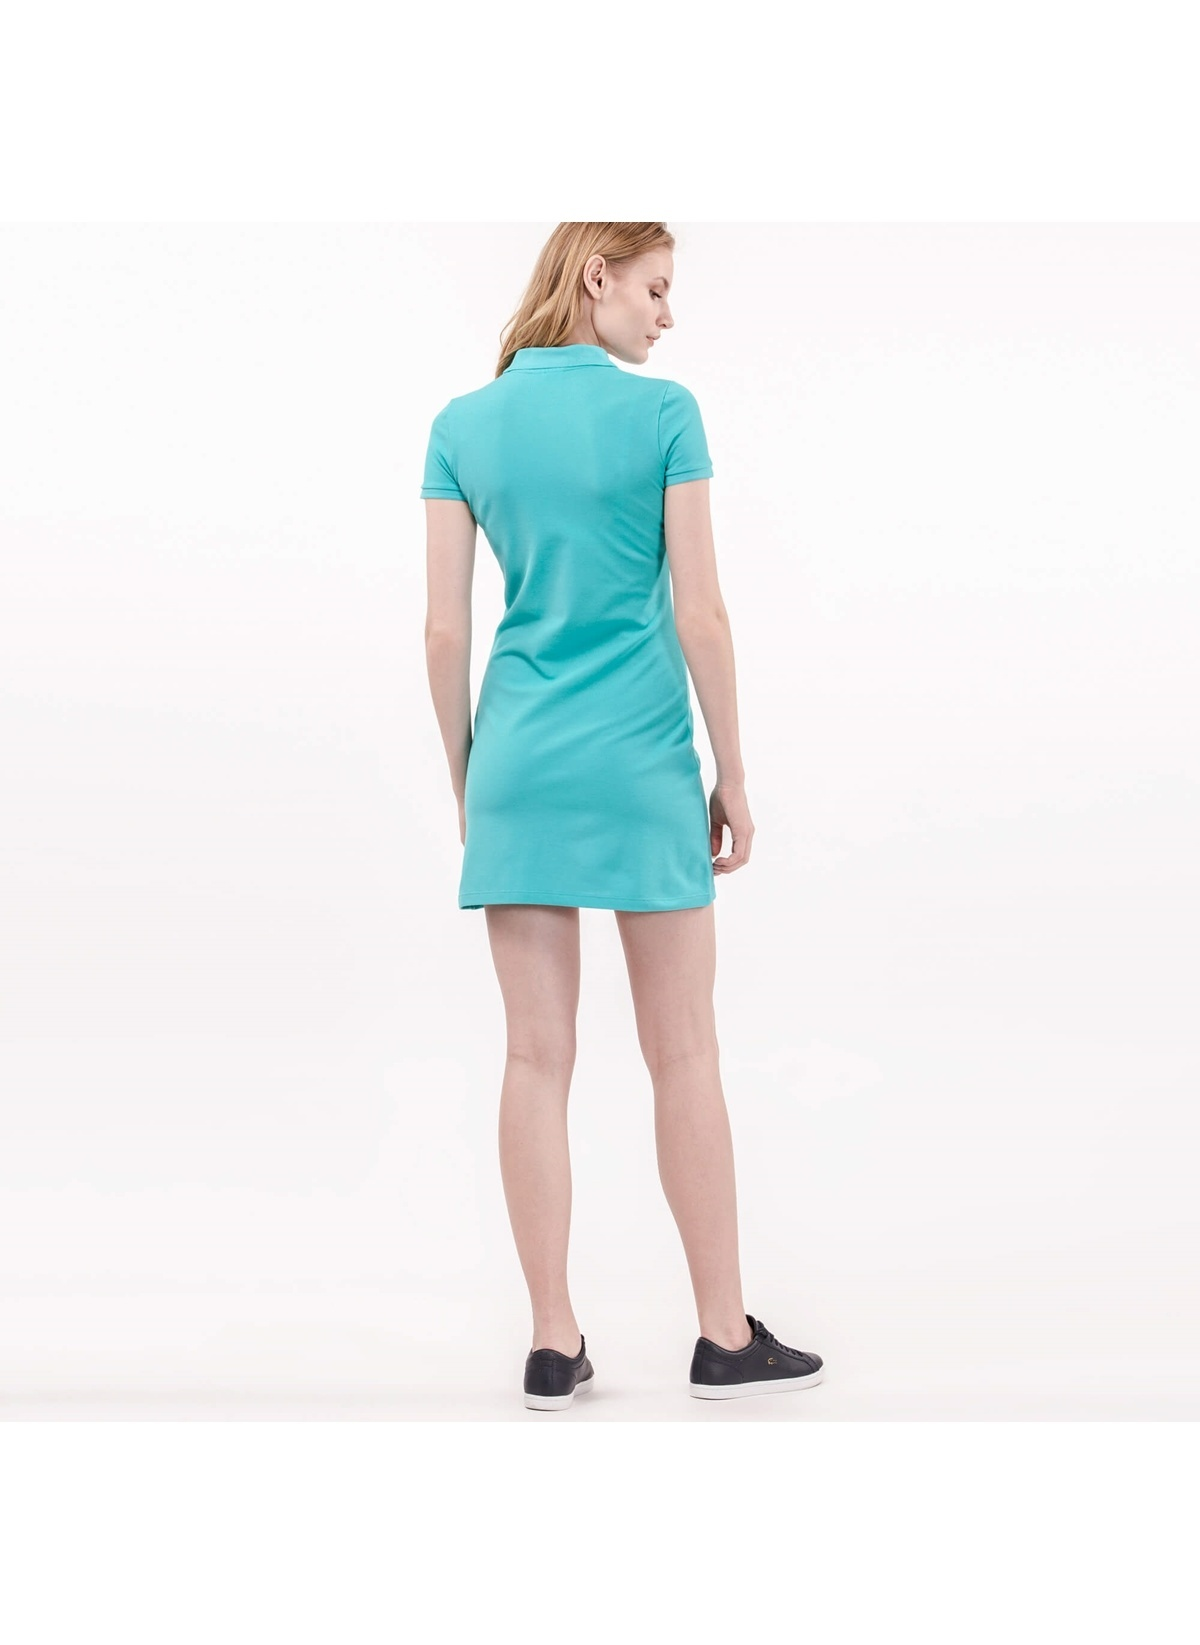 4cbcfbe0fa73d Lacoste Kadın Kısa Kollu Mini Elbise Renkli | Morhipo | 21006022